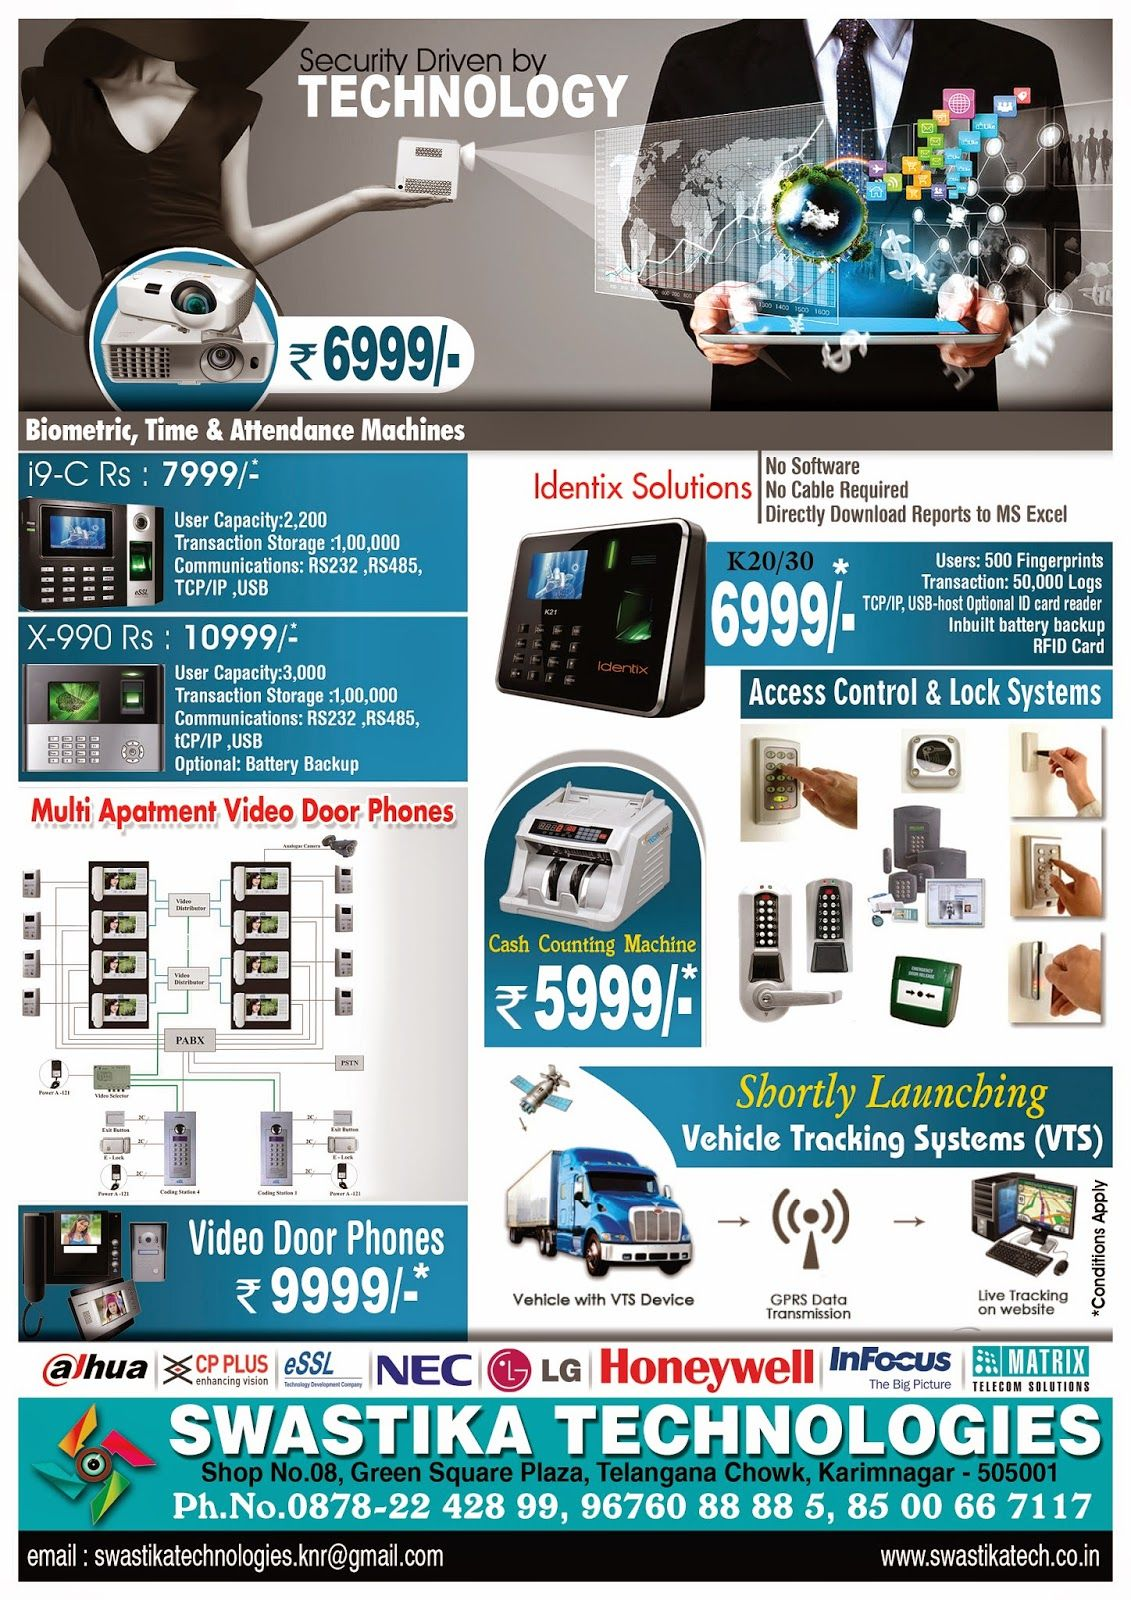 NaveenGFX Com Swastika Technologies Brochure Design